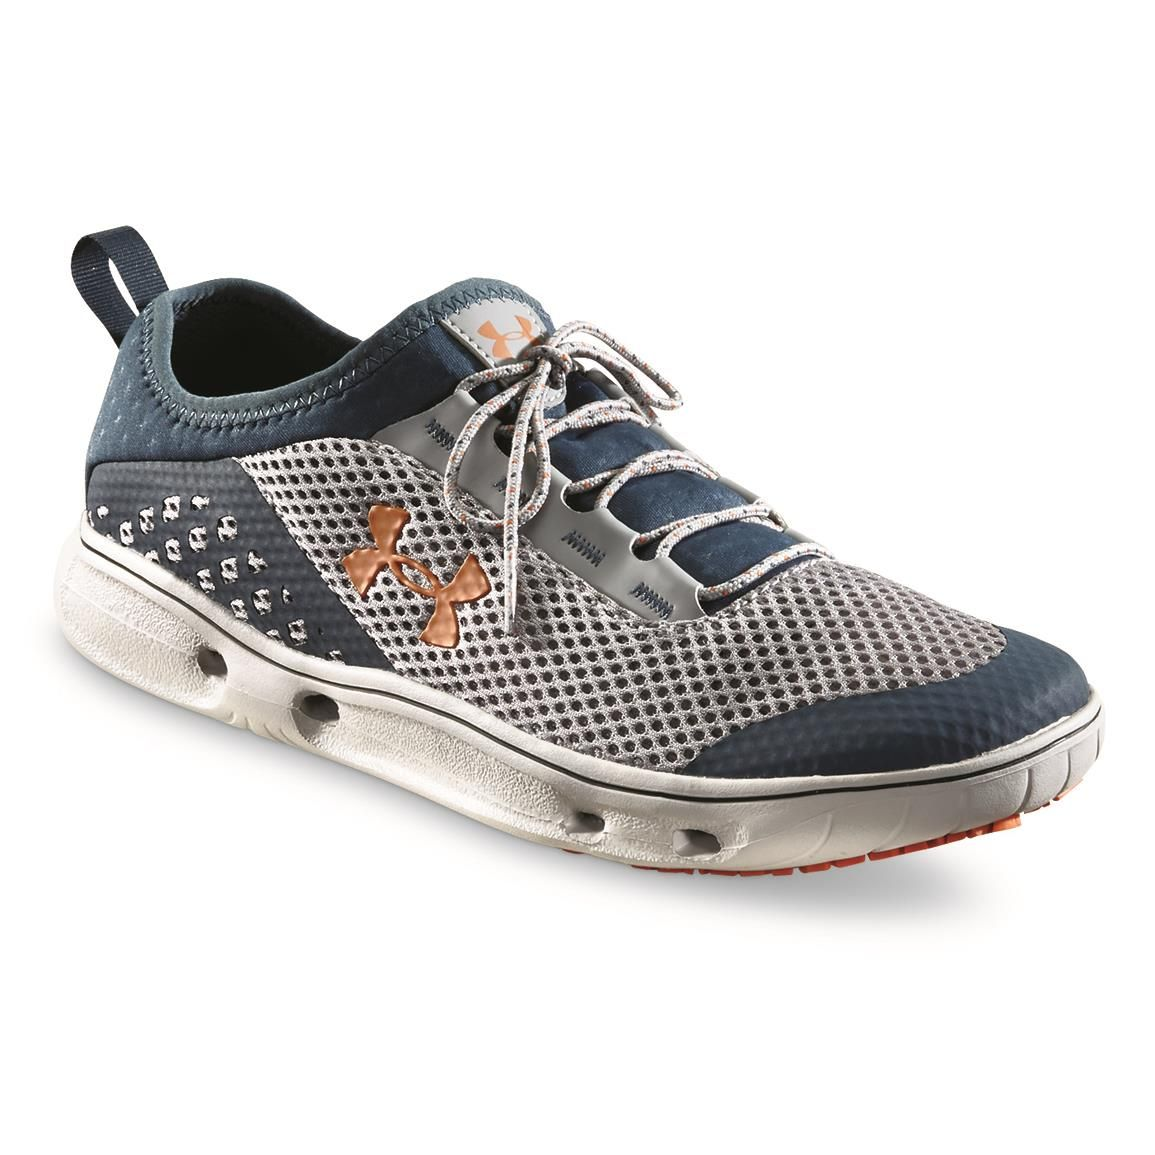 Under Armour Men's Kilchis Water Shoes